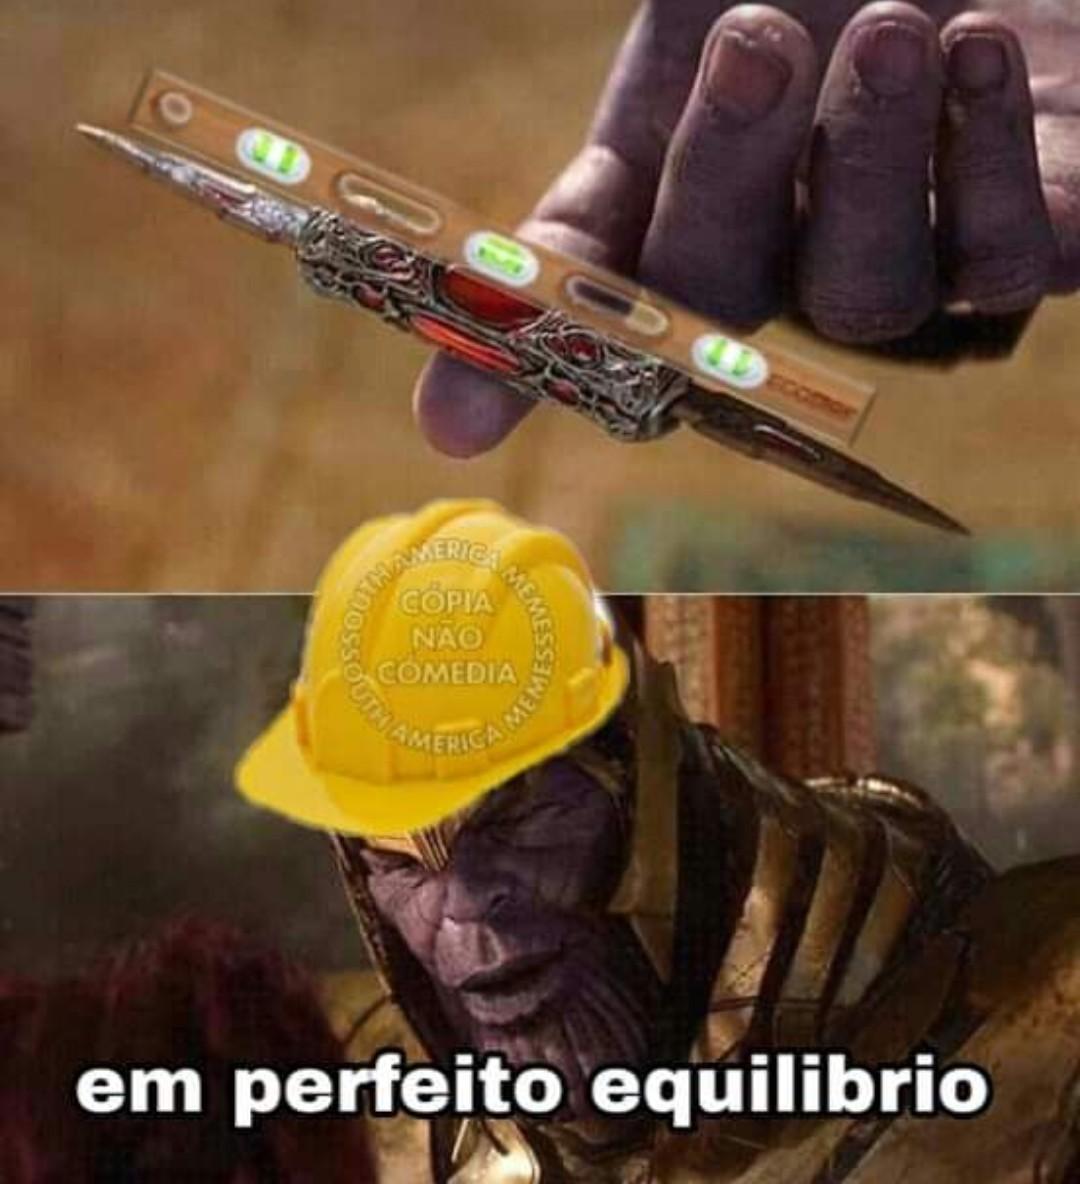 Equilibriu - meme